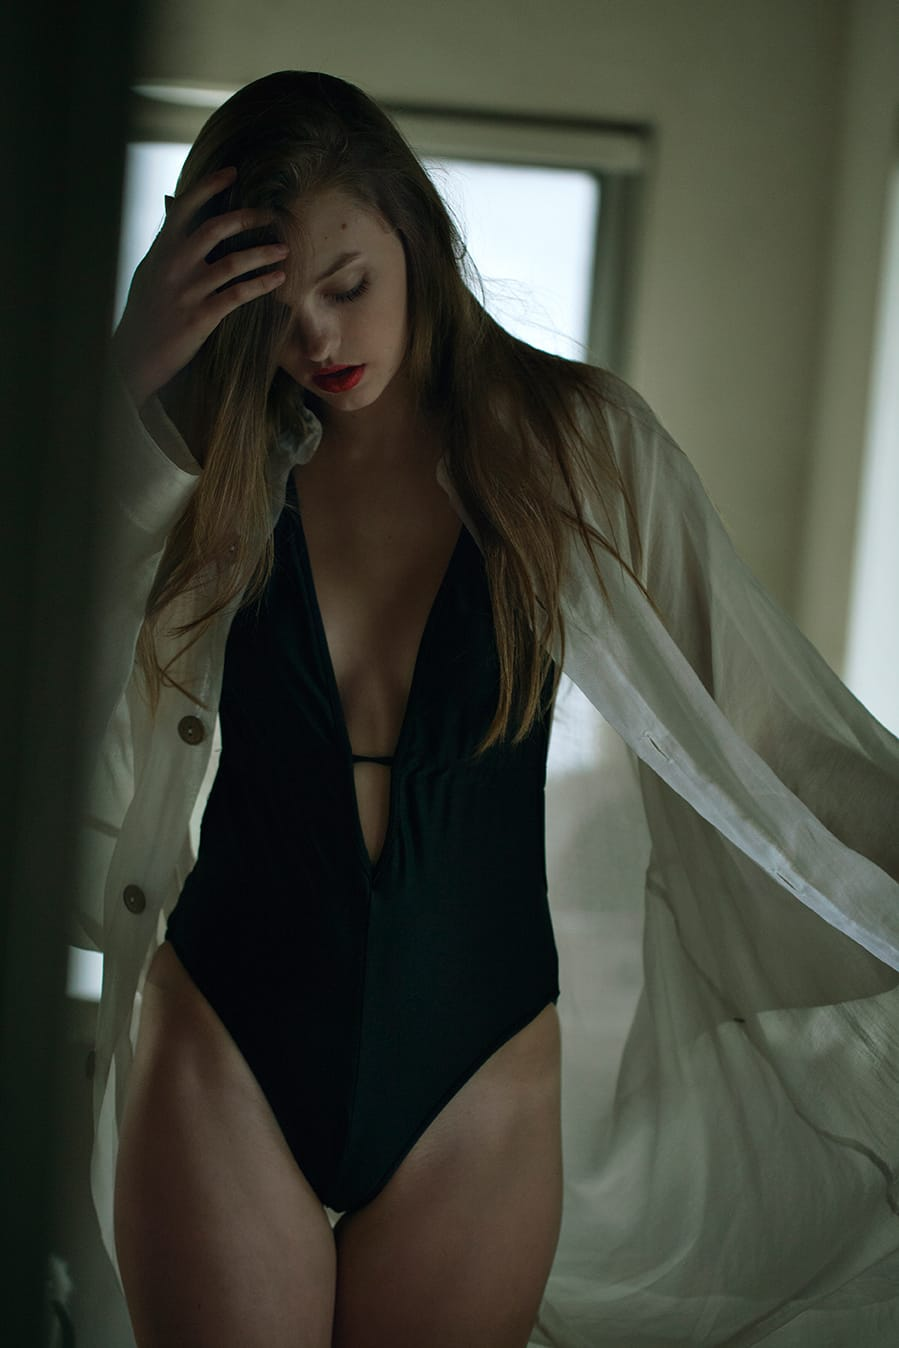 Erotica Olivia Brower nude (84 photos), Sexy, Cleavage, Feet, cameltoe 2019